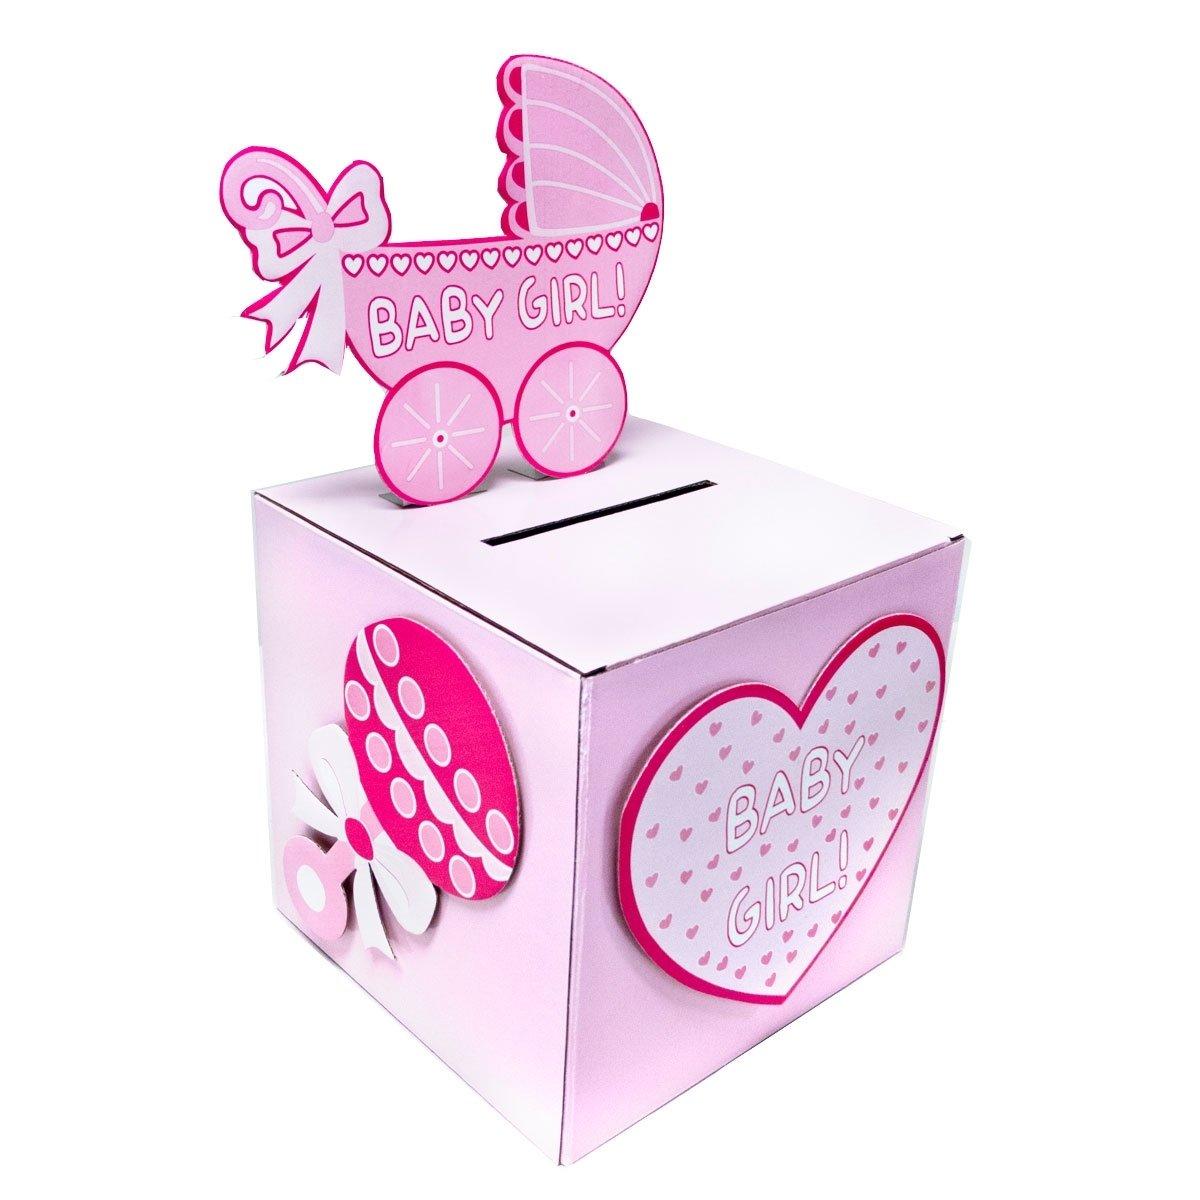 10 Fantastic Baby Shower Wishing Well Ideas ifavor123 babyshower wishing well card gift or money box girl 2020